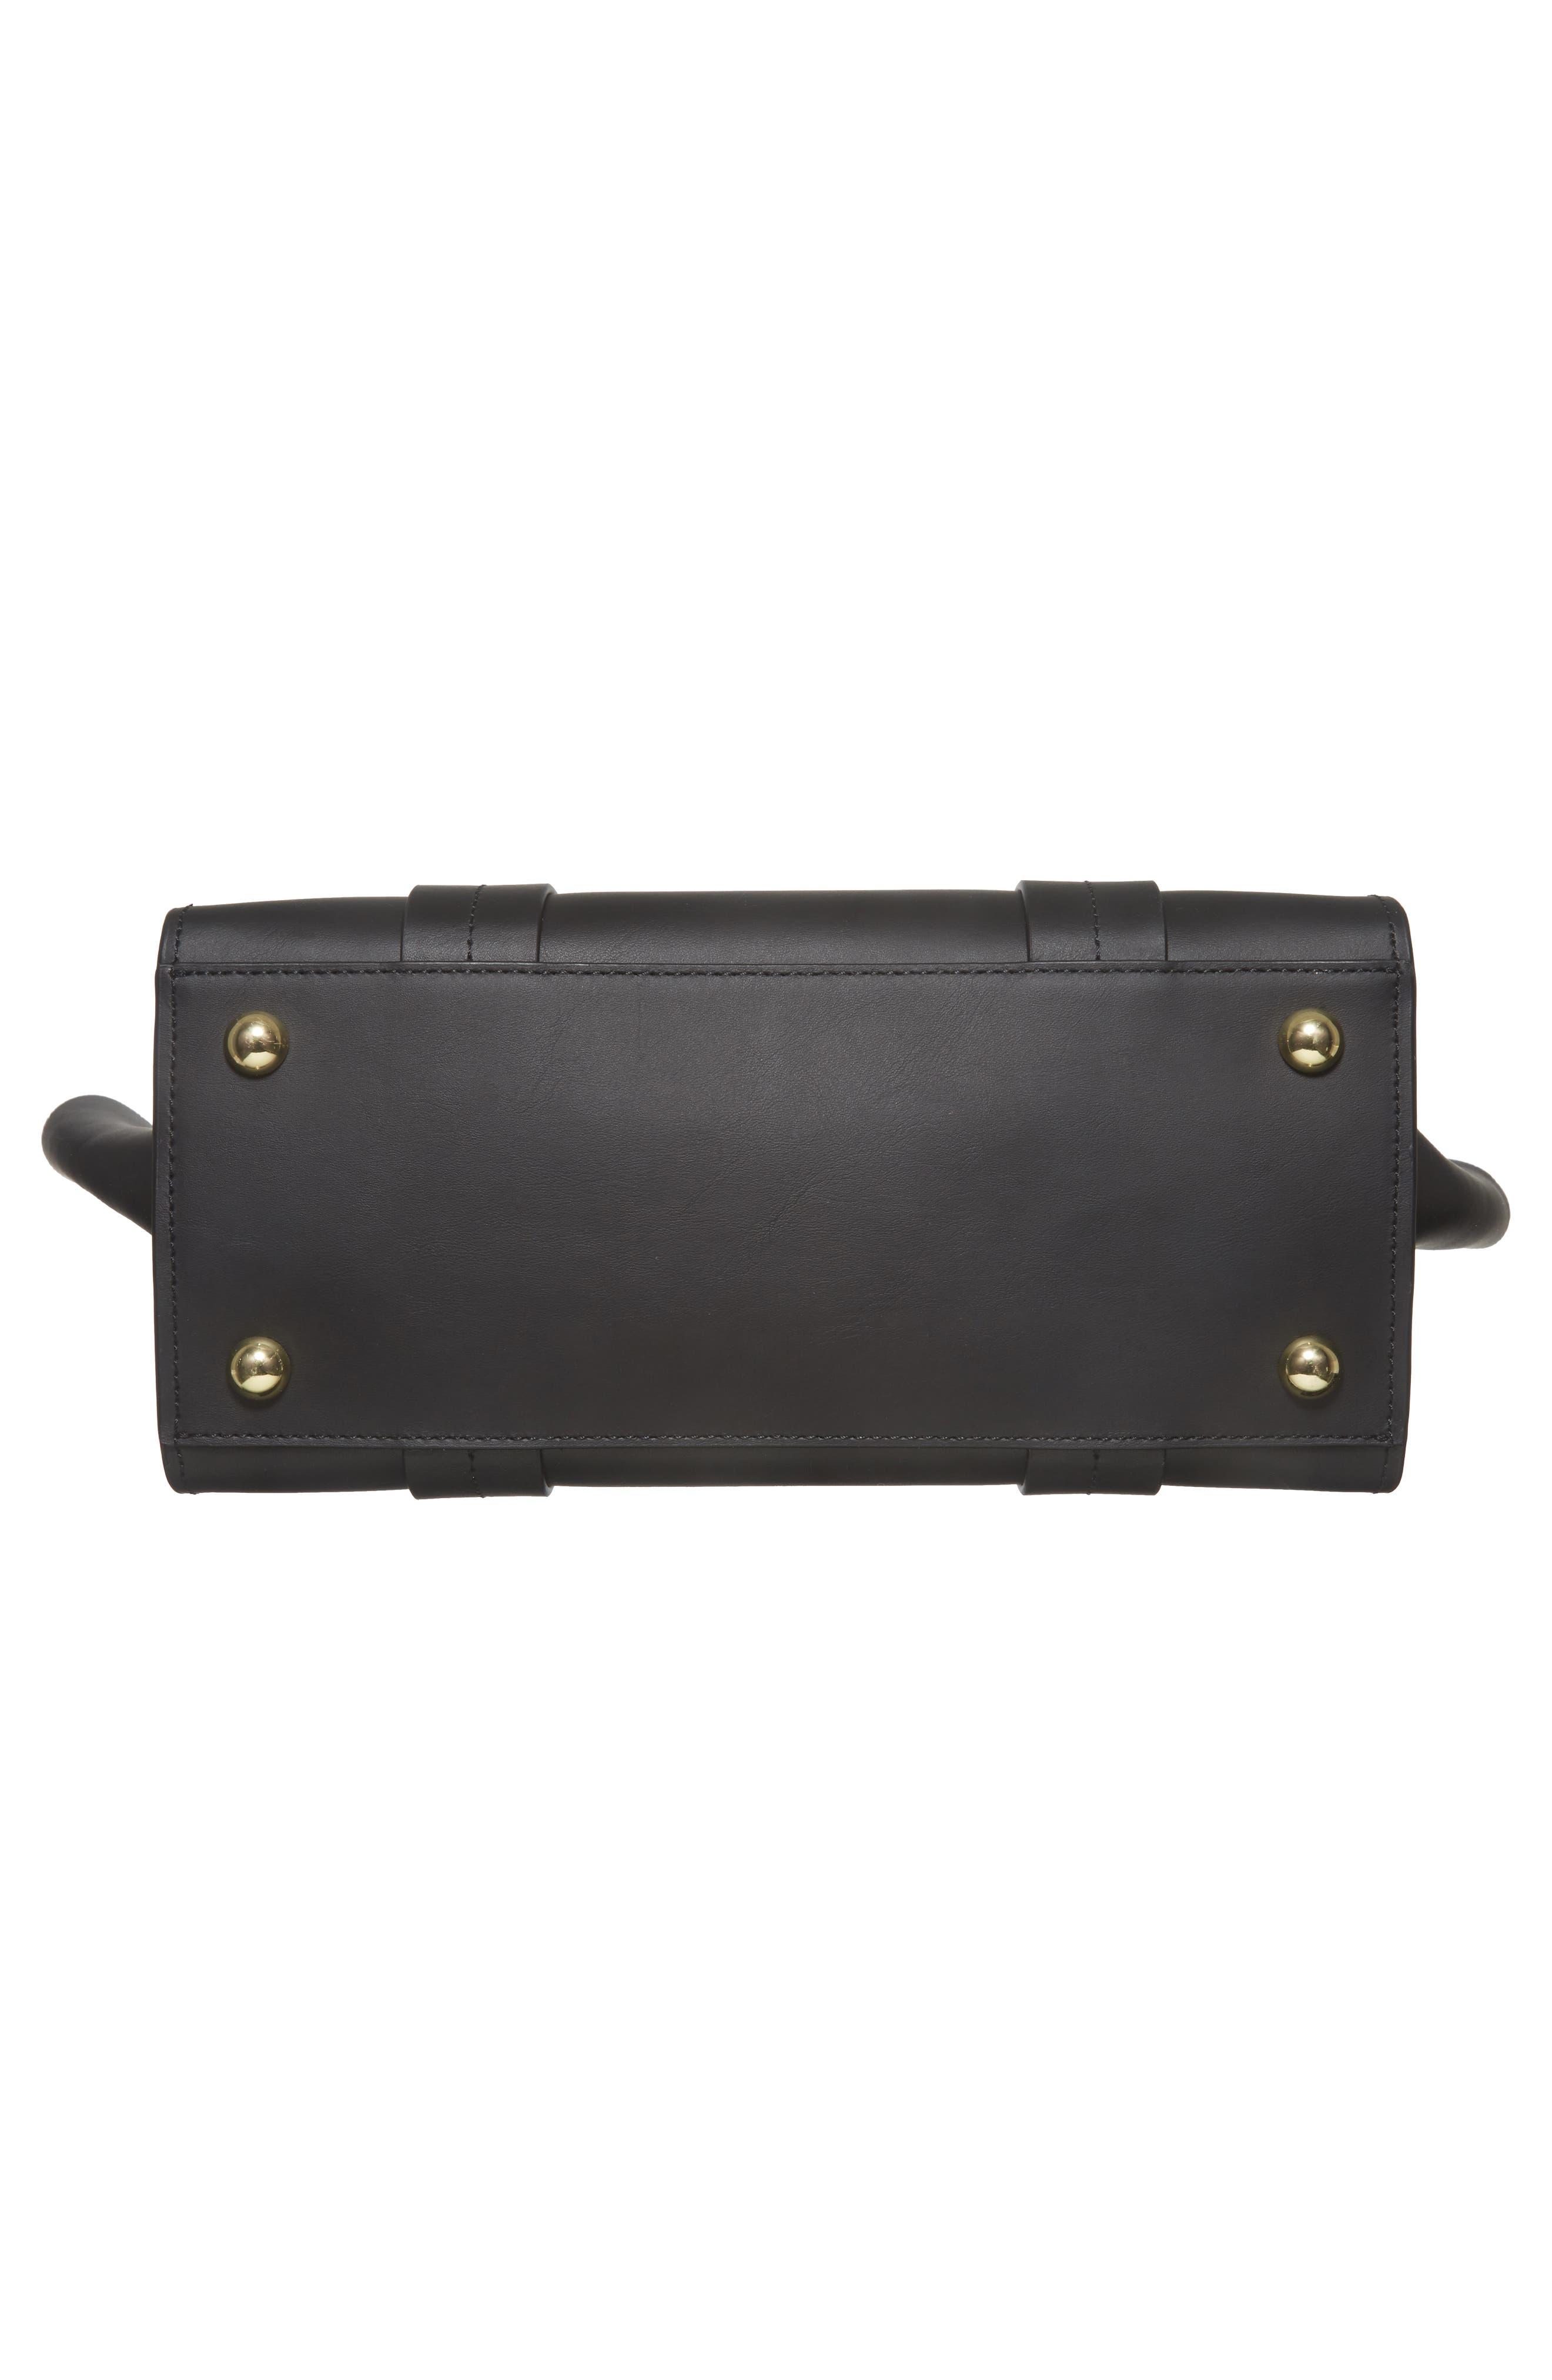 ZAC Zac Posen Eartha Iconic Calfskin Leather Double Handle Satchel,                             Alternate thumbnail 6, color,                             Black